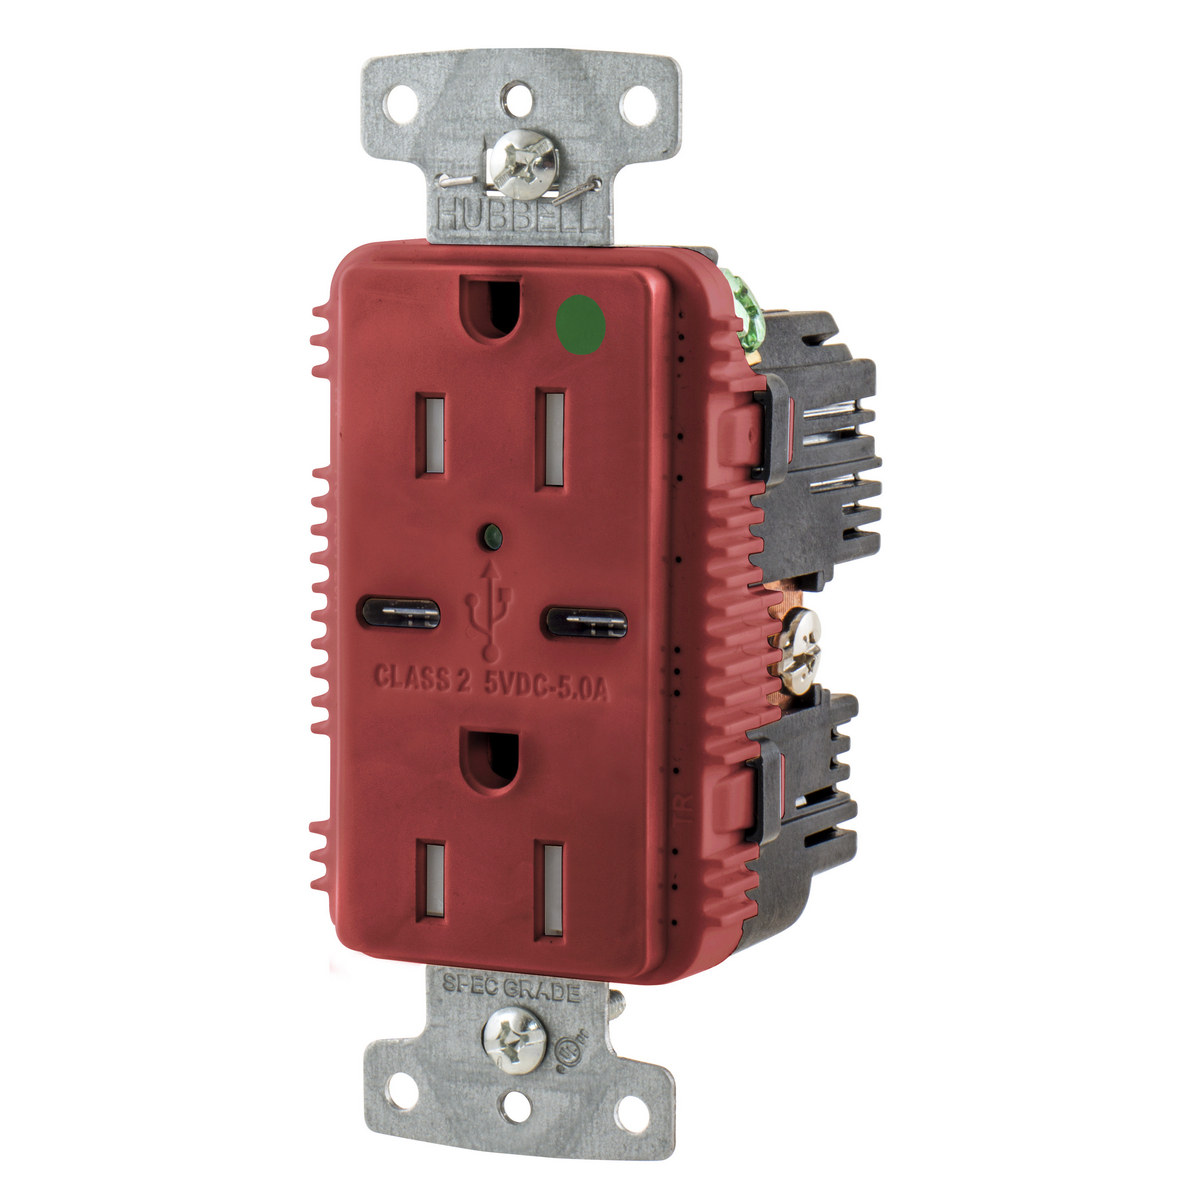 usb8200c5r brand hubbell rh hubbell com